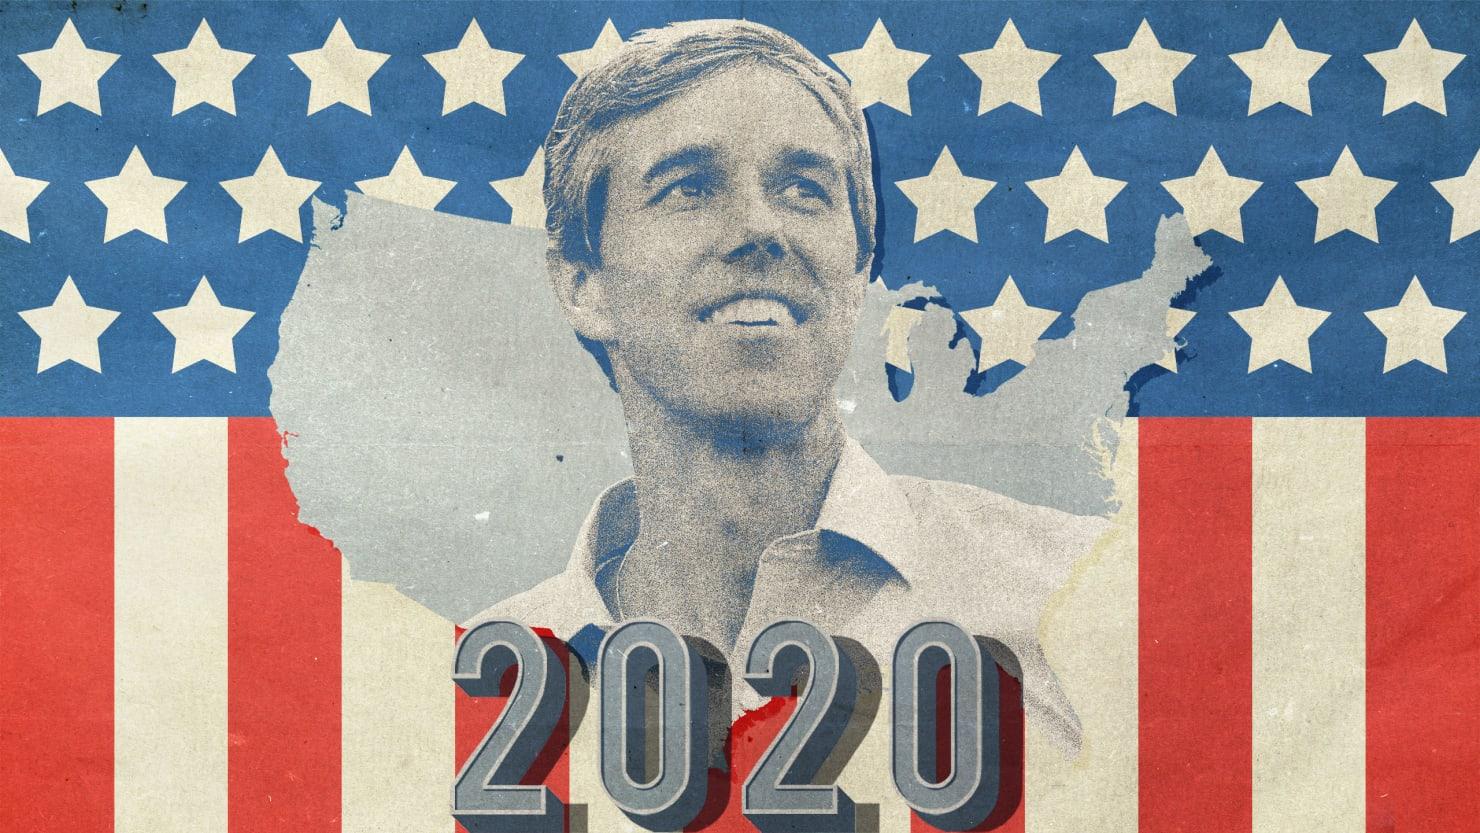 Beto ORourkes Greatest 2020 StrengthAnd Biggest Weakness